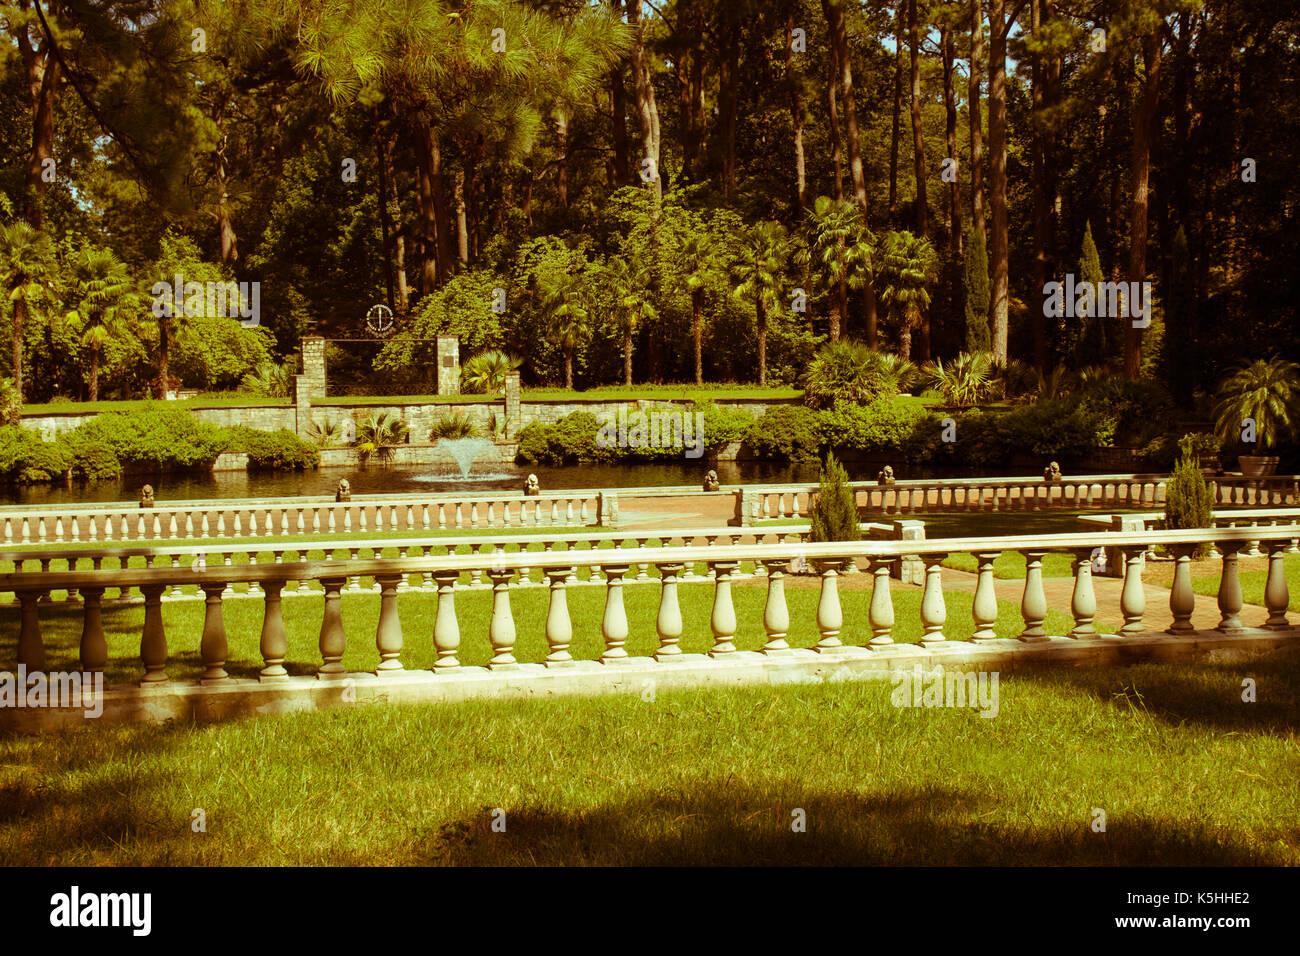 Norfolk Botanical Gardens Stock Photos & Norfolk Botanical Gardens ...